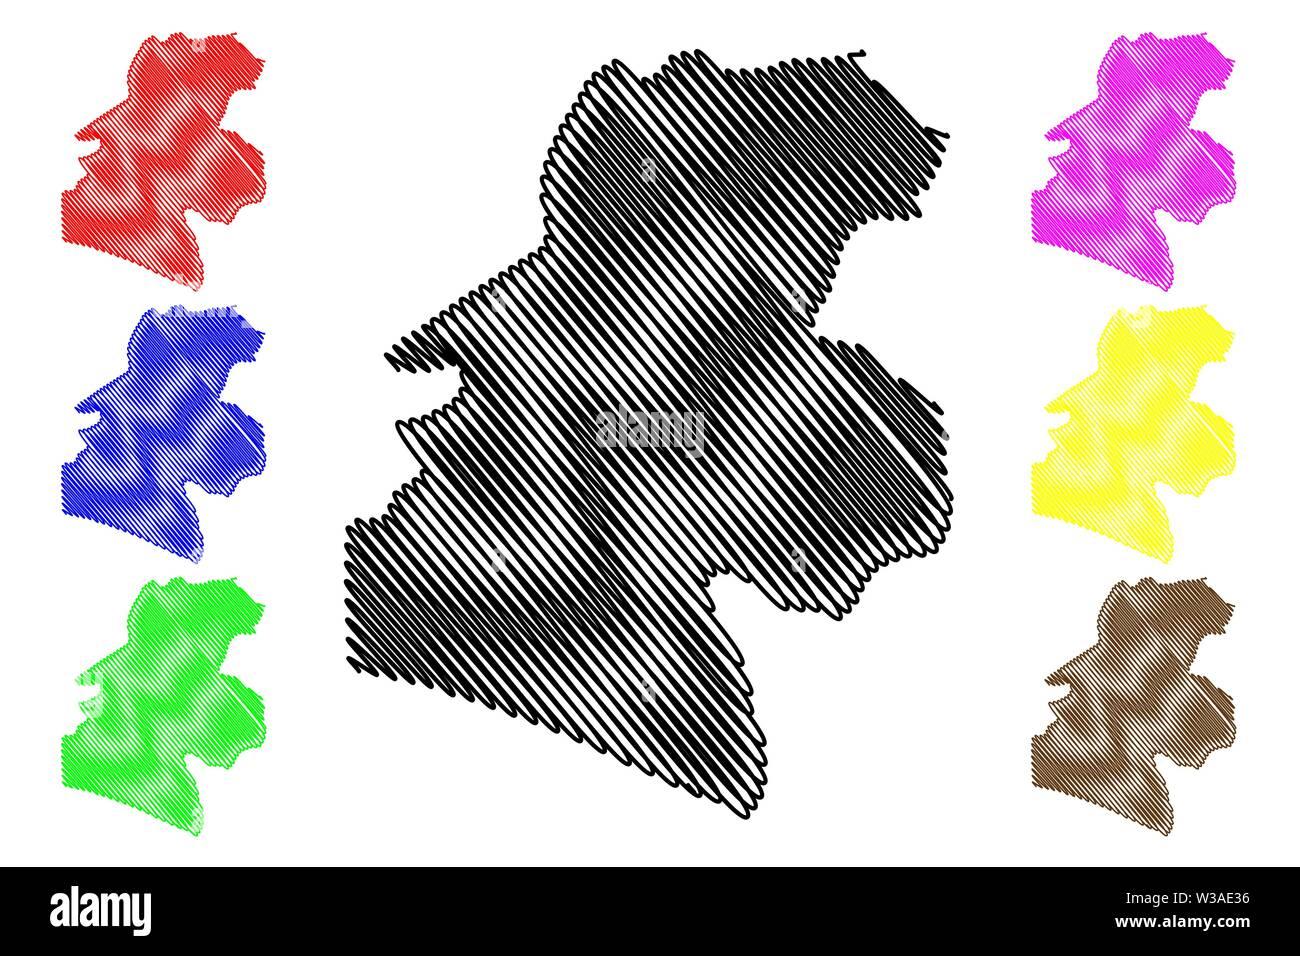 Santa Rosa Department (Republic of Guatemala, Departments of ... on map of france departments, guatemalan departments, map de guatemala, map of georgia departments, map of mexico and belize, map of colombia departments,